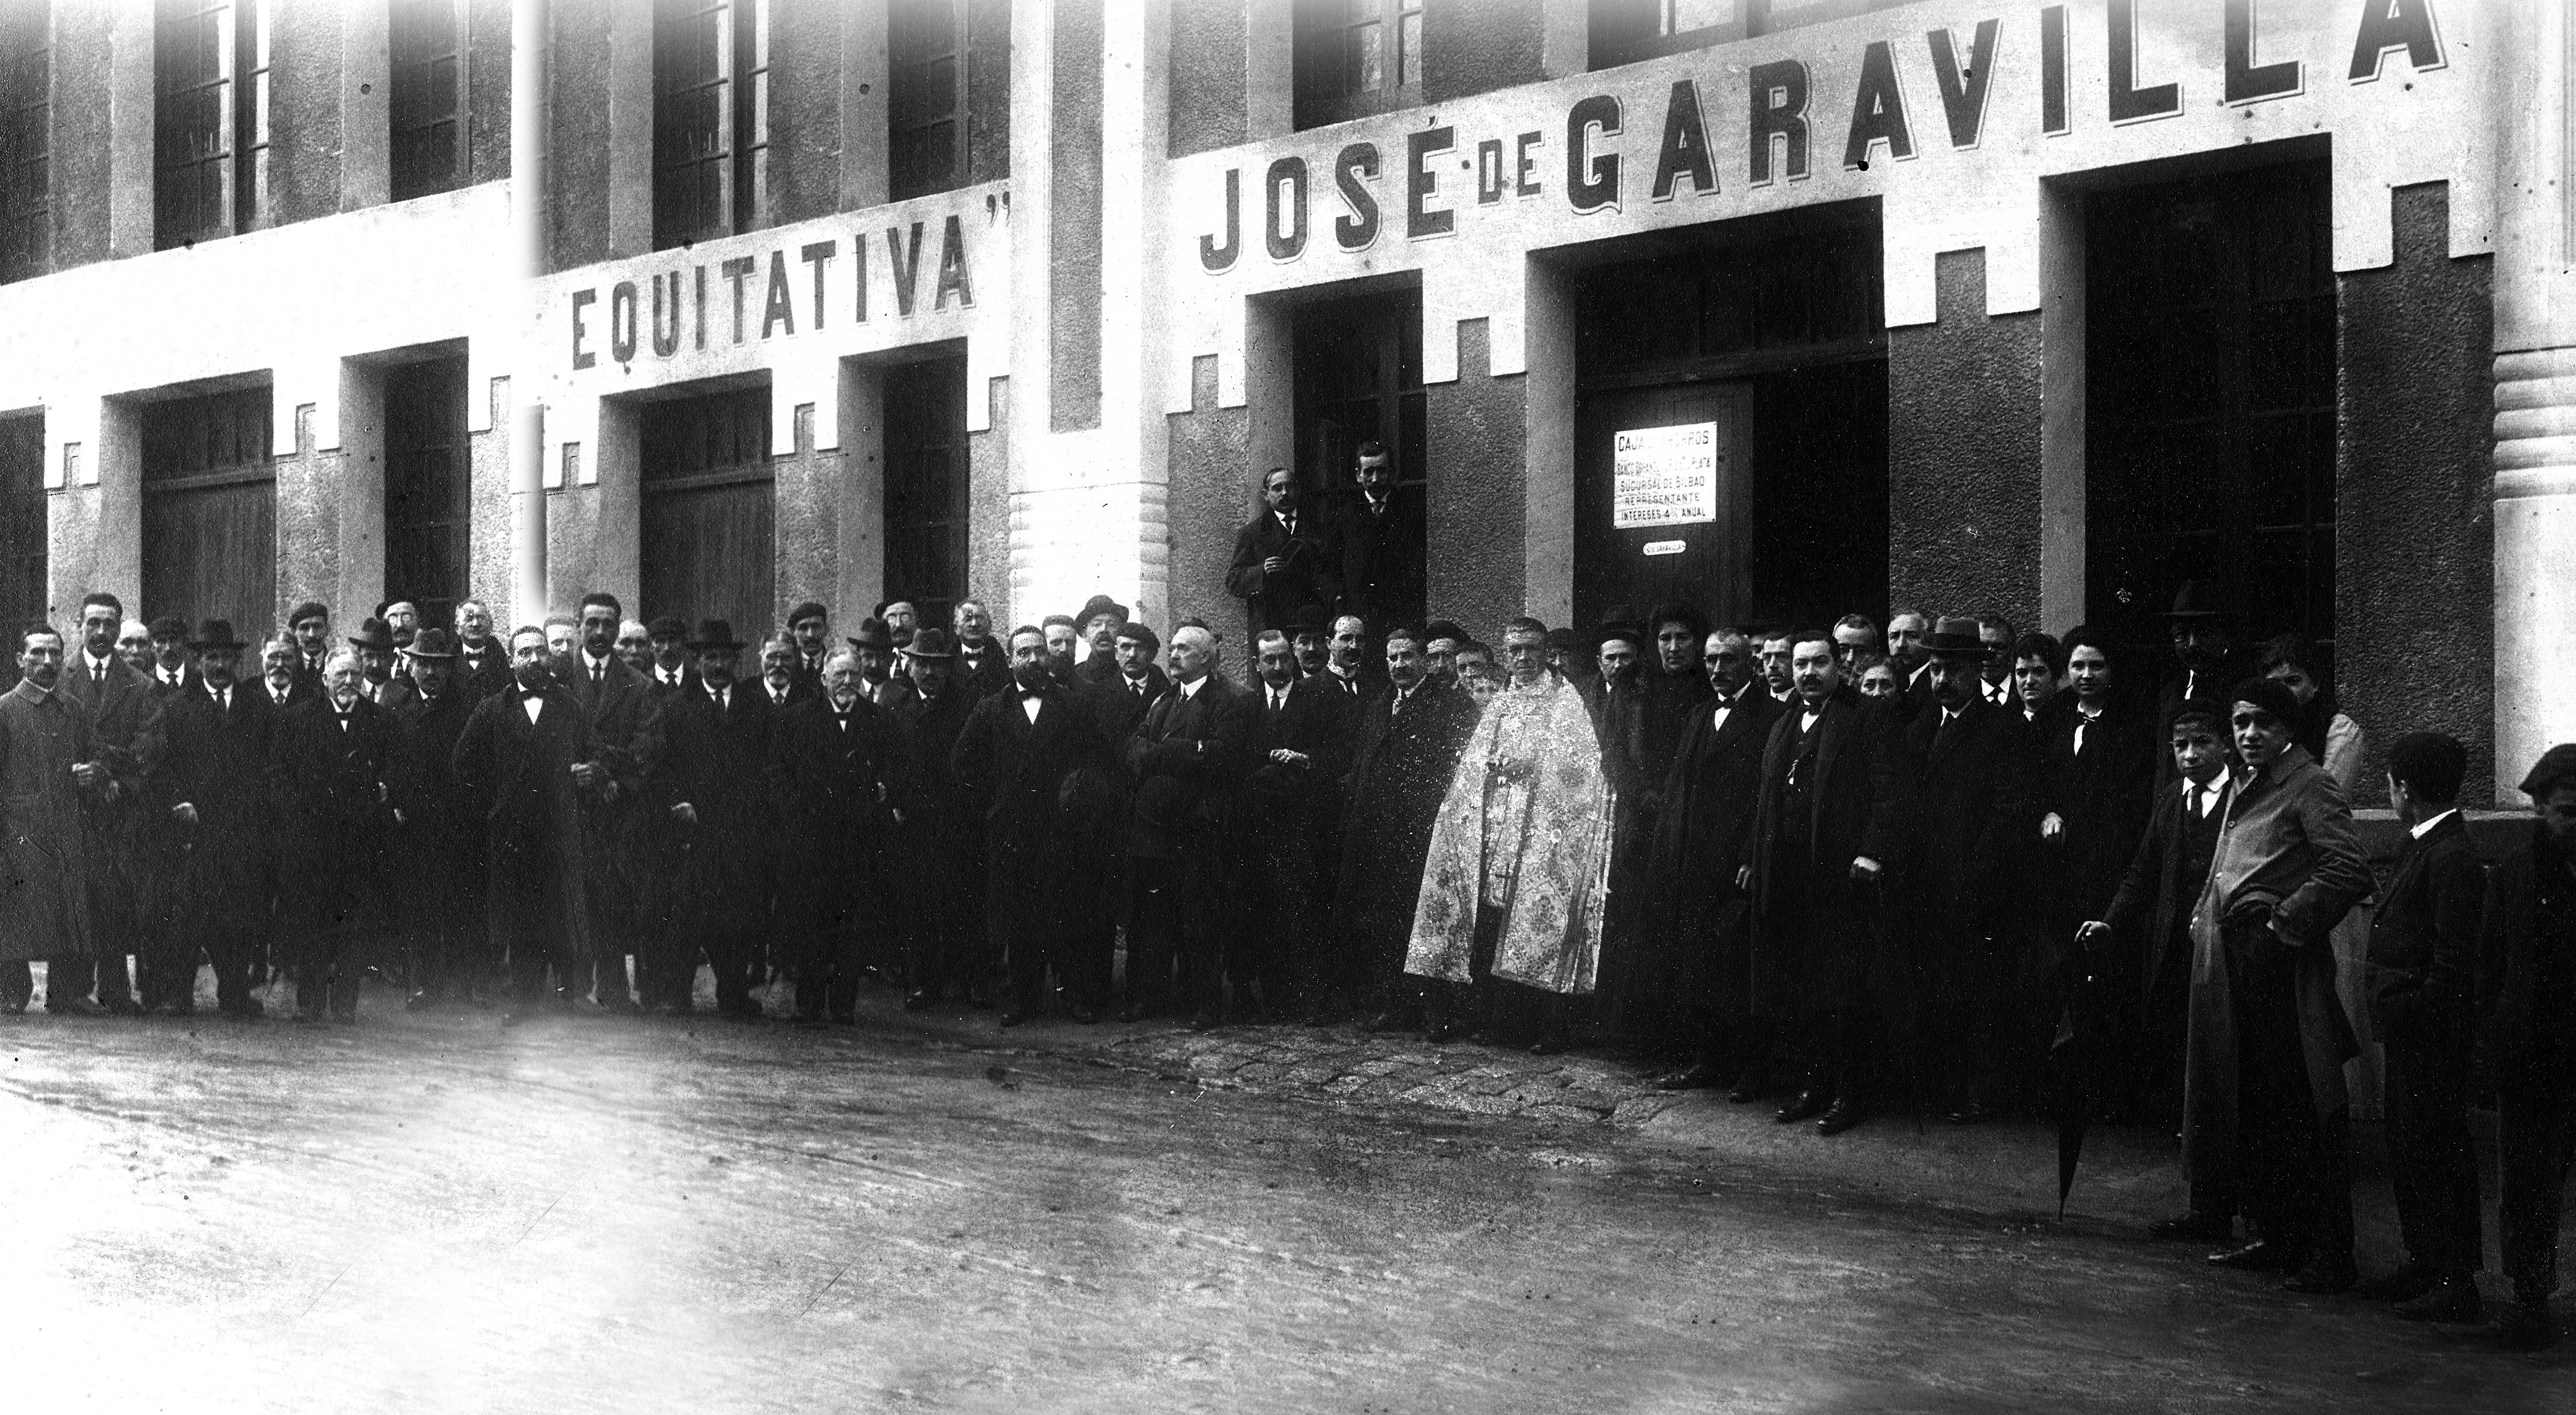 https://www.marcasrenombradas.com/wp-content/uploads/2014/10/Jose-de-Garavilla.jpg